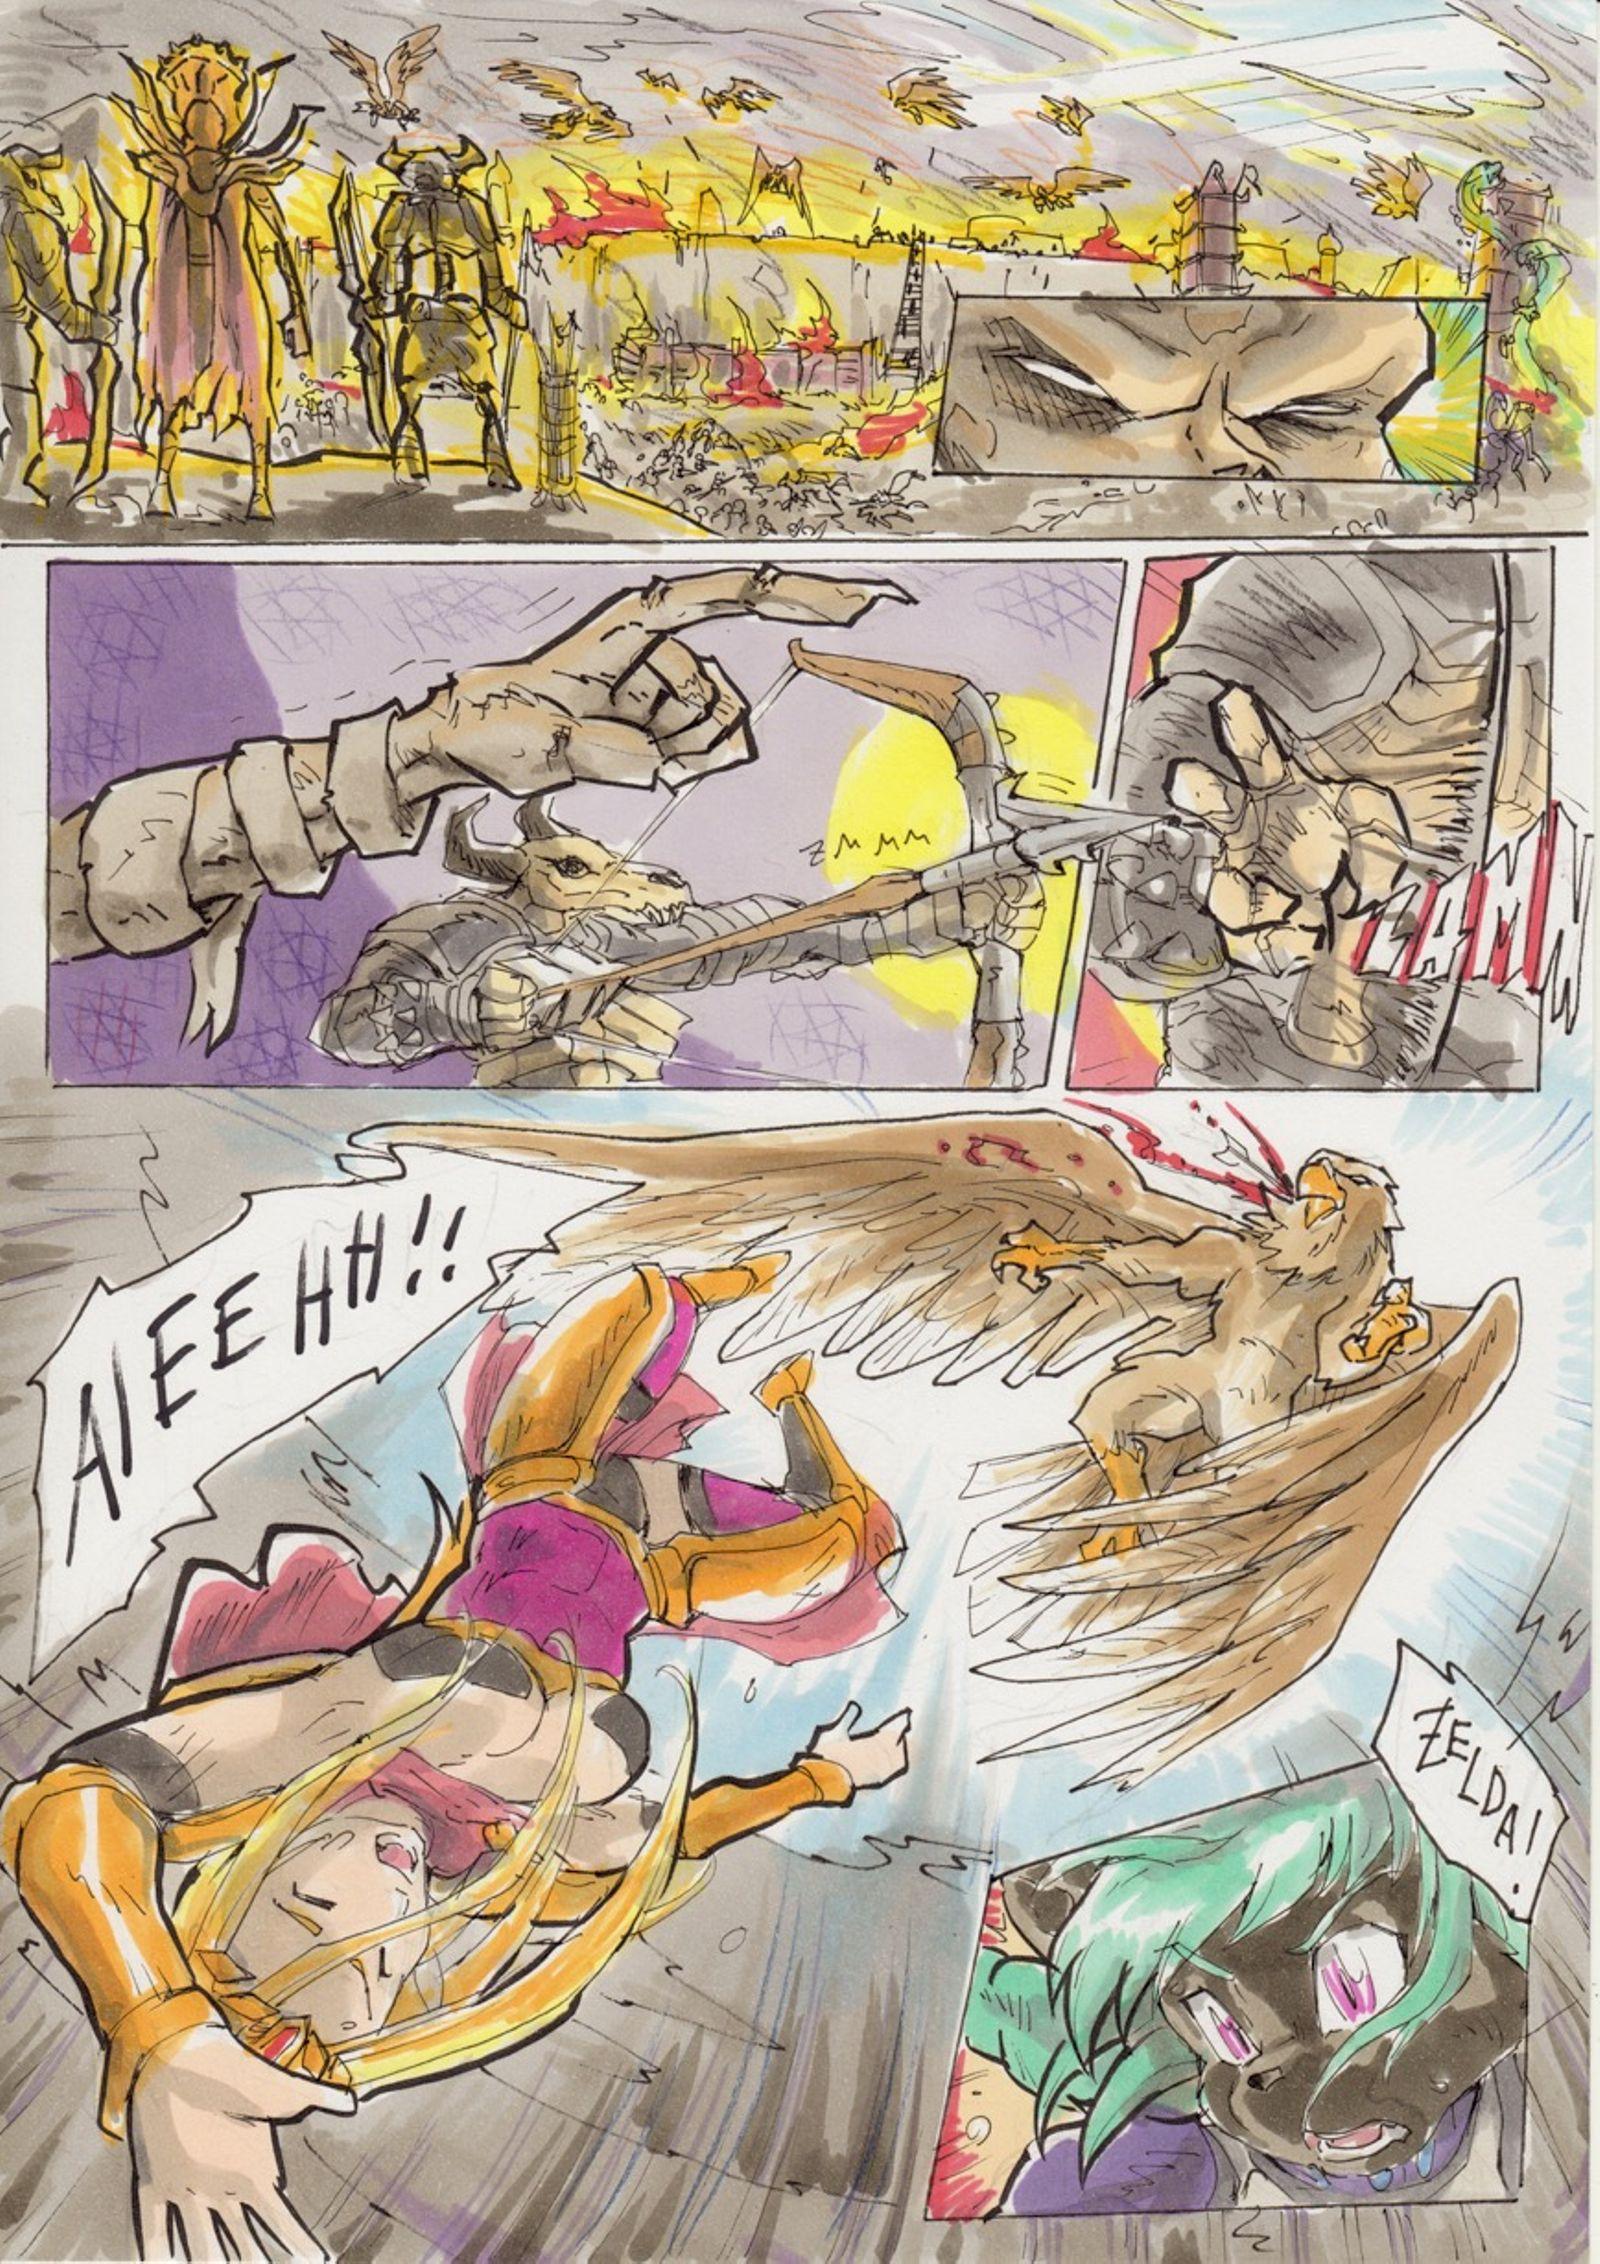 Anubis Stories 5 - The Battle for Anubipolis porn comics Blowjob, Creampie, Cum Shots, Cum Swallow, Fantasy, fingering, Furry, Masturbation, Oral sex, Sex and Magic, Straight, Titfuck